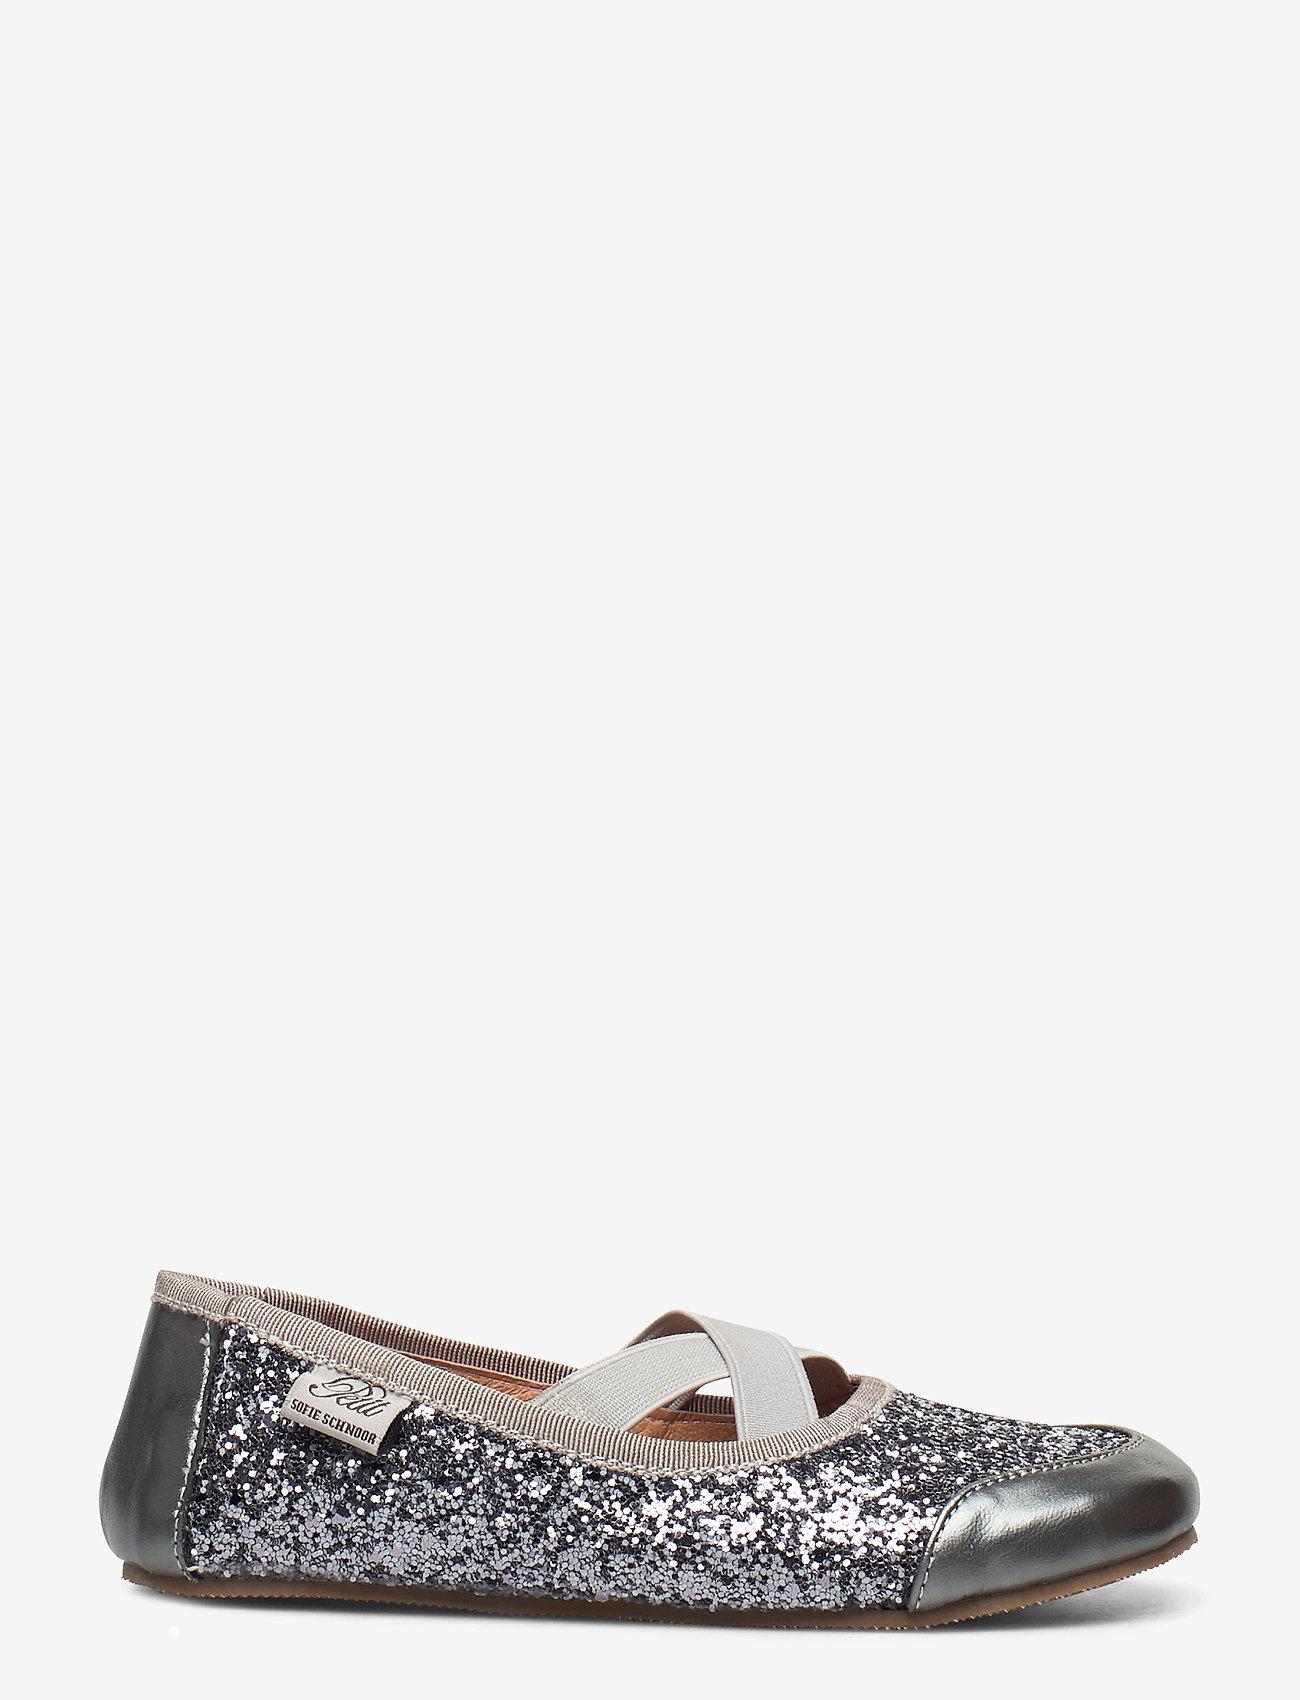 Petit by Sofie Schnoor - Indoors shoe - glitter - hausschuhe - grey glitter - 1